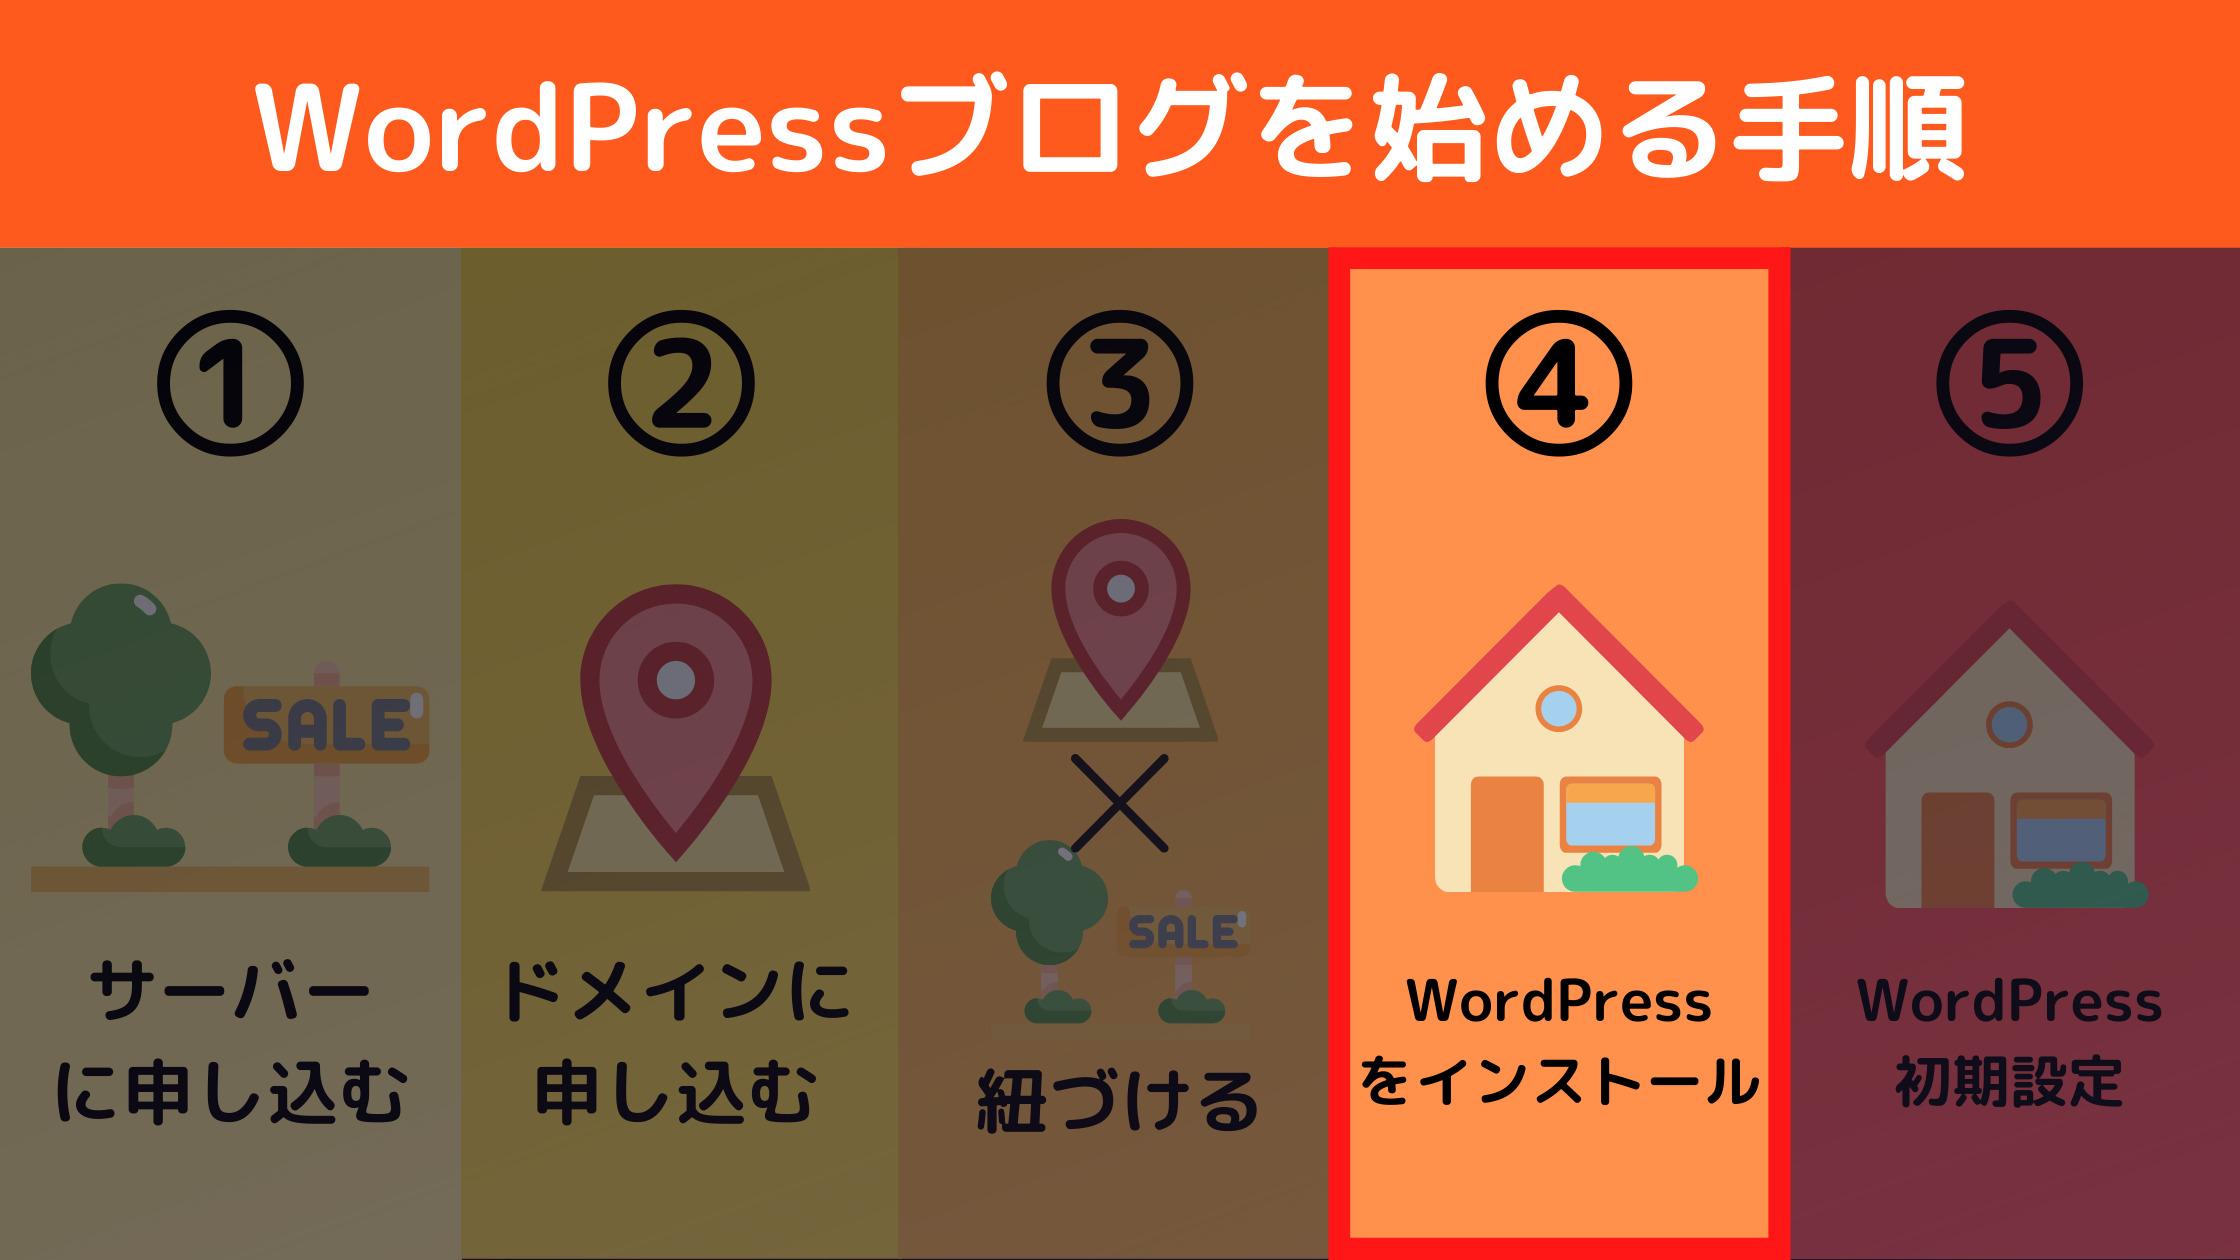 ④WordPressをインストールする